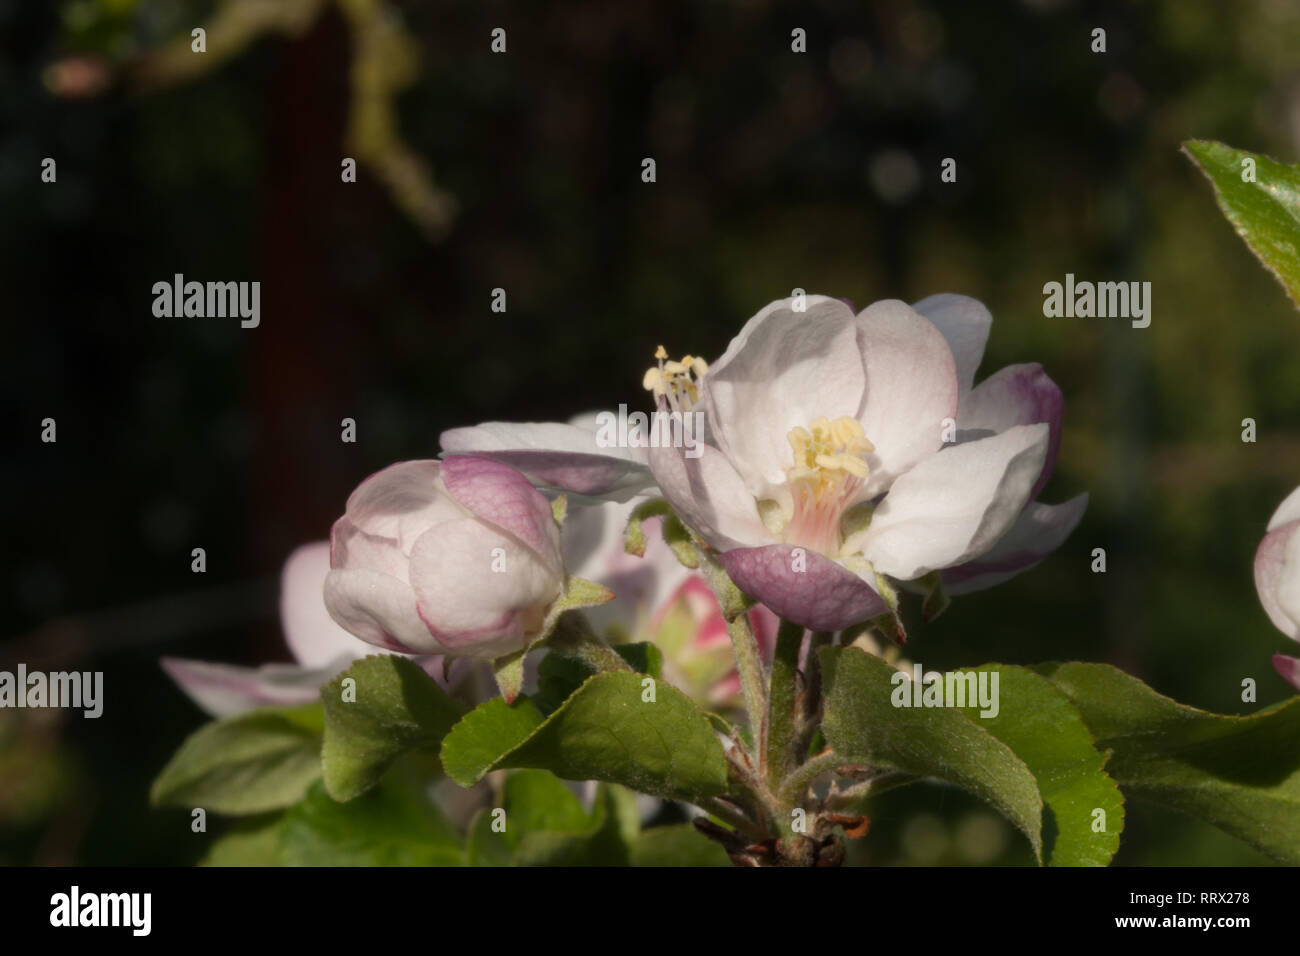 closeup view,black background,dark background,currant twig,background,black,bud,closeup,currant,dark,spring,twig,view,plant Stock Photo